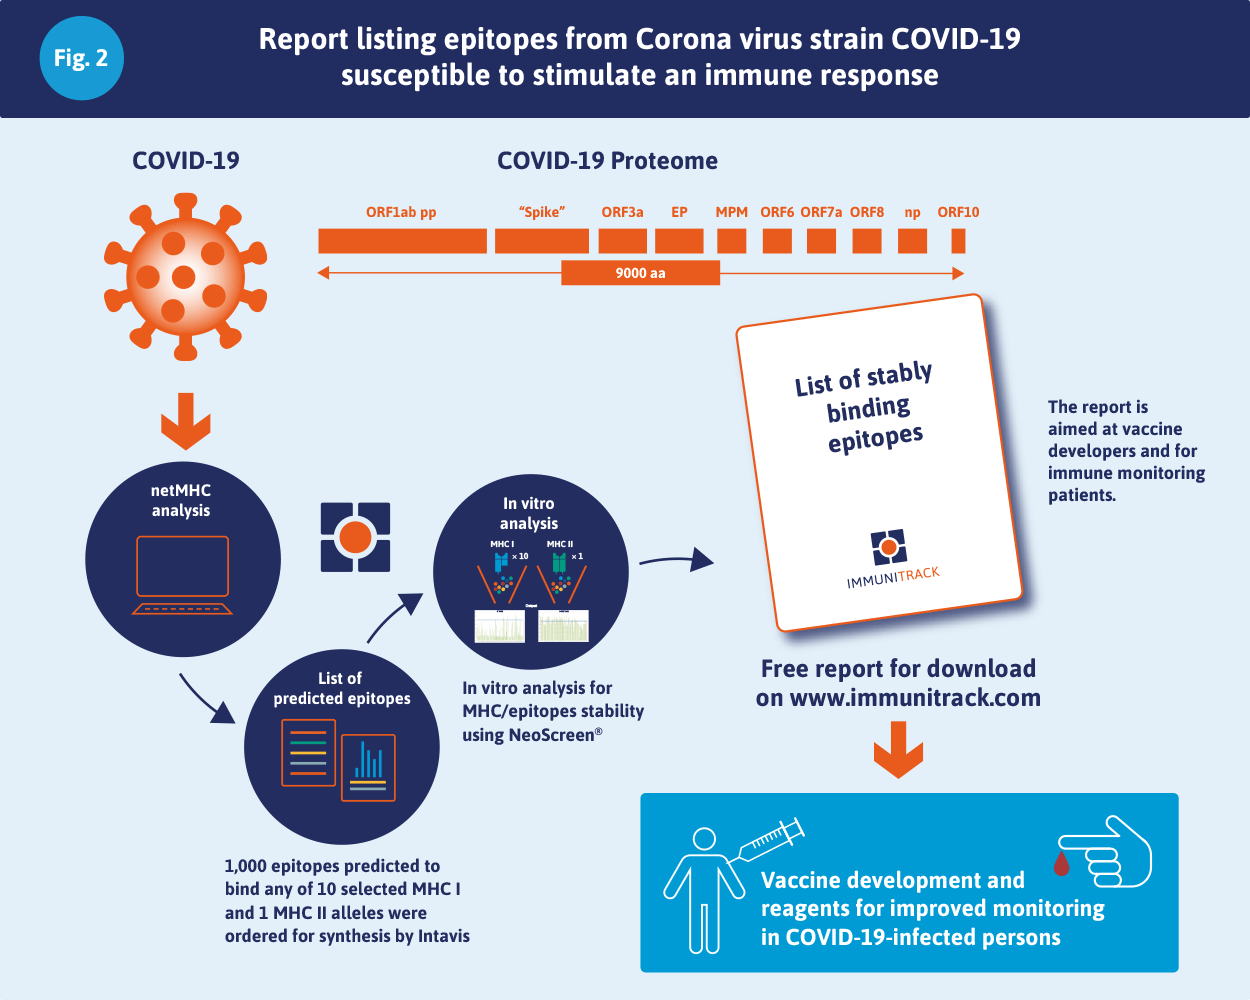 Report listing epitopes from Corona virus strain Covid-19